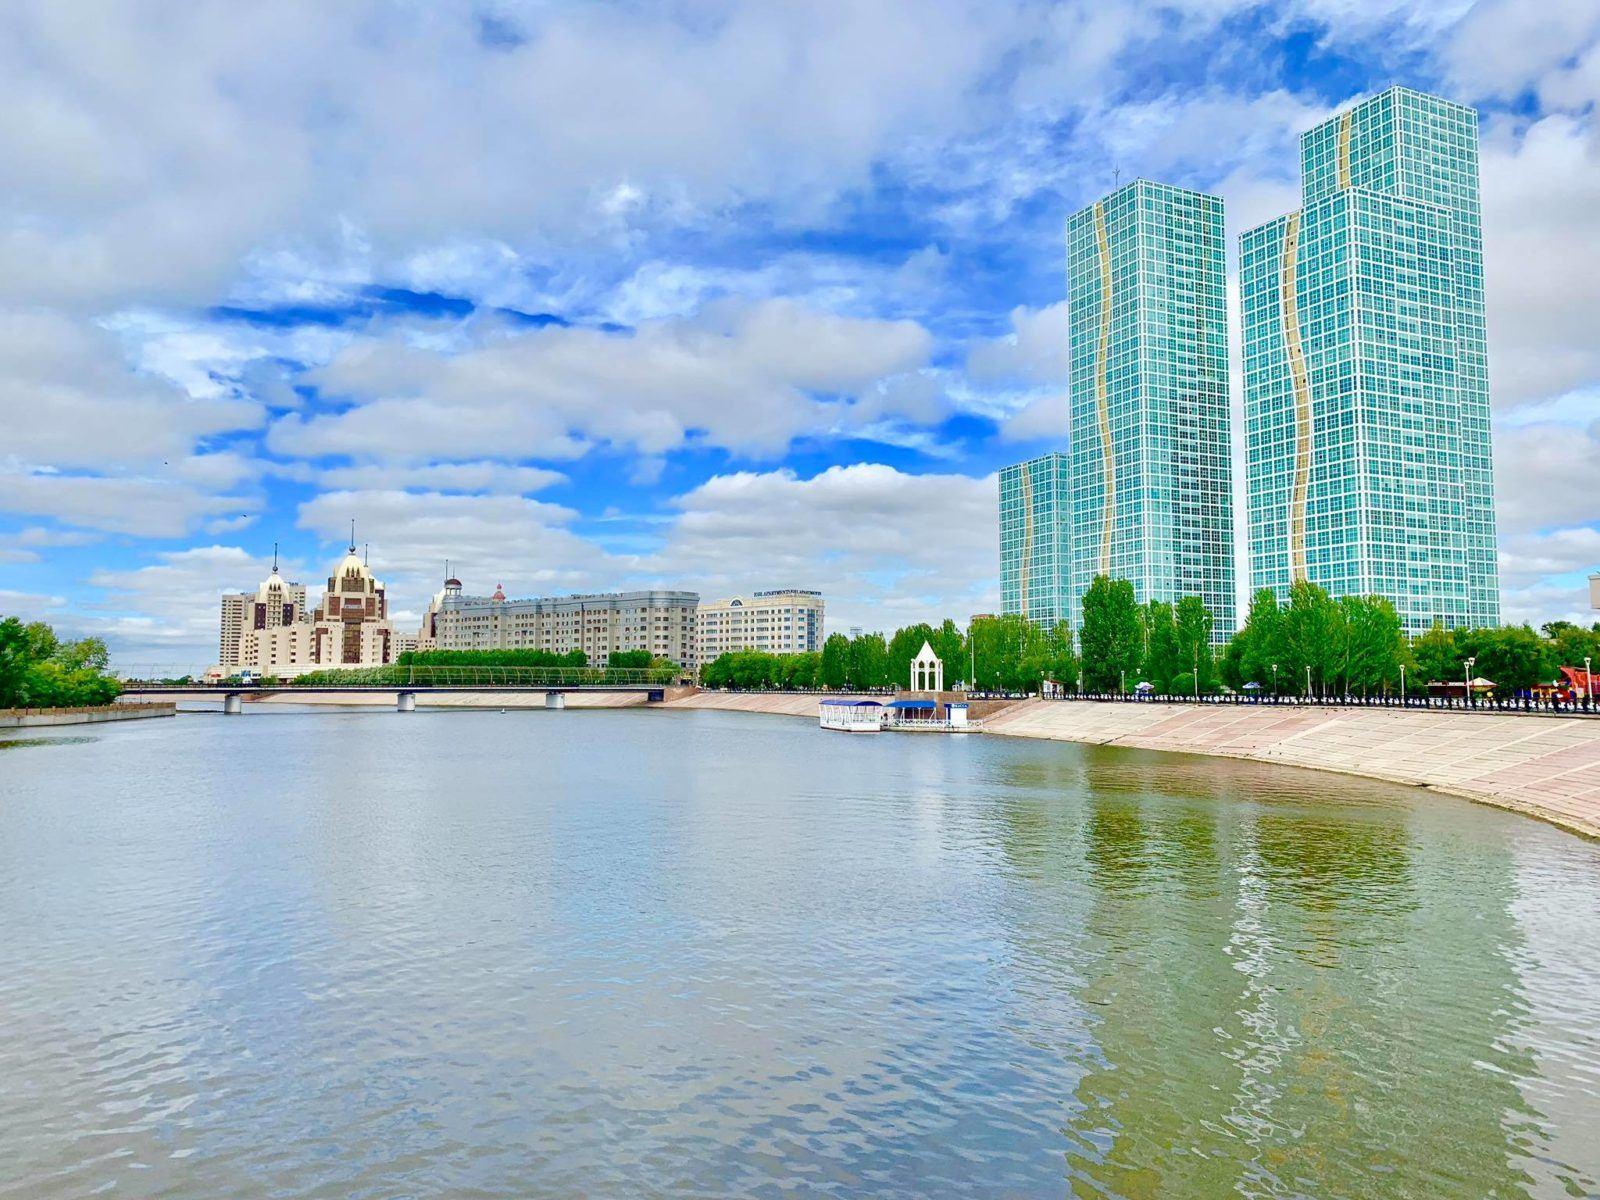 Staying at The Ritz Carlton Astana9